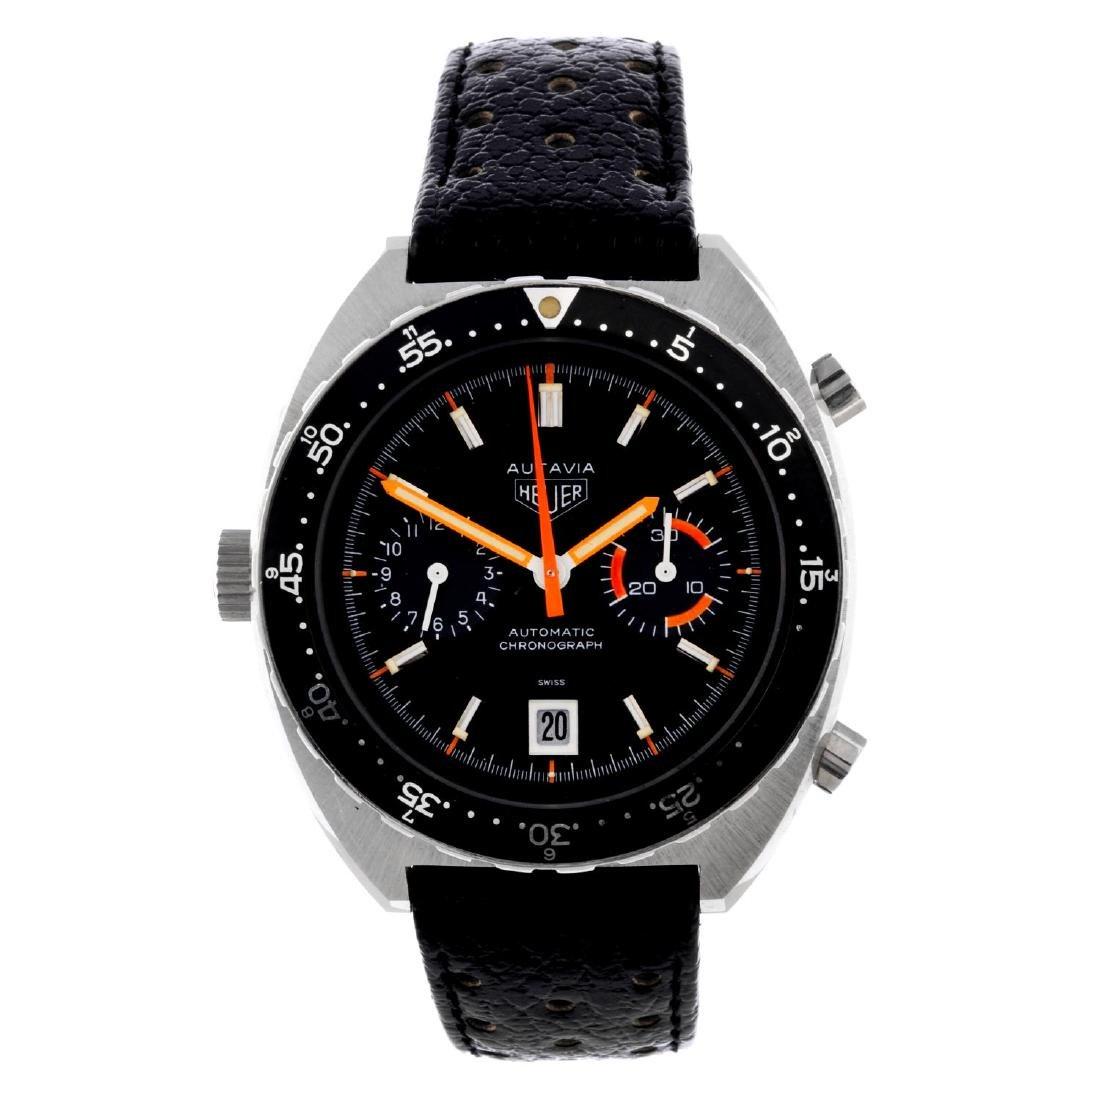 HEUER - a gentleman's Autavia chronograph wrist watch.